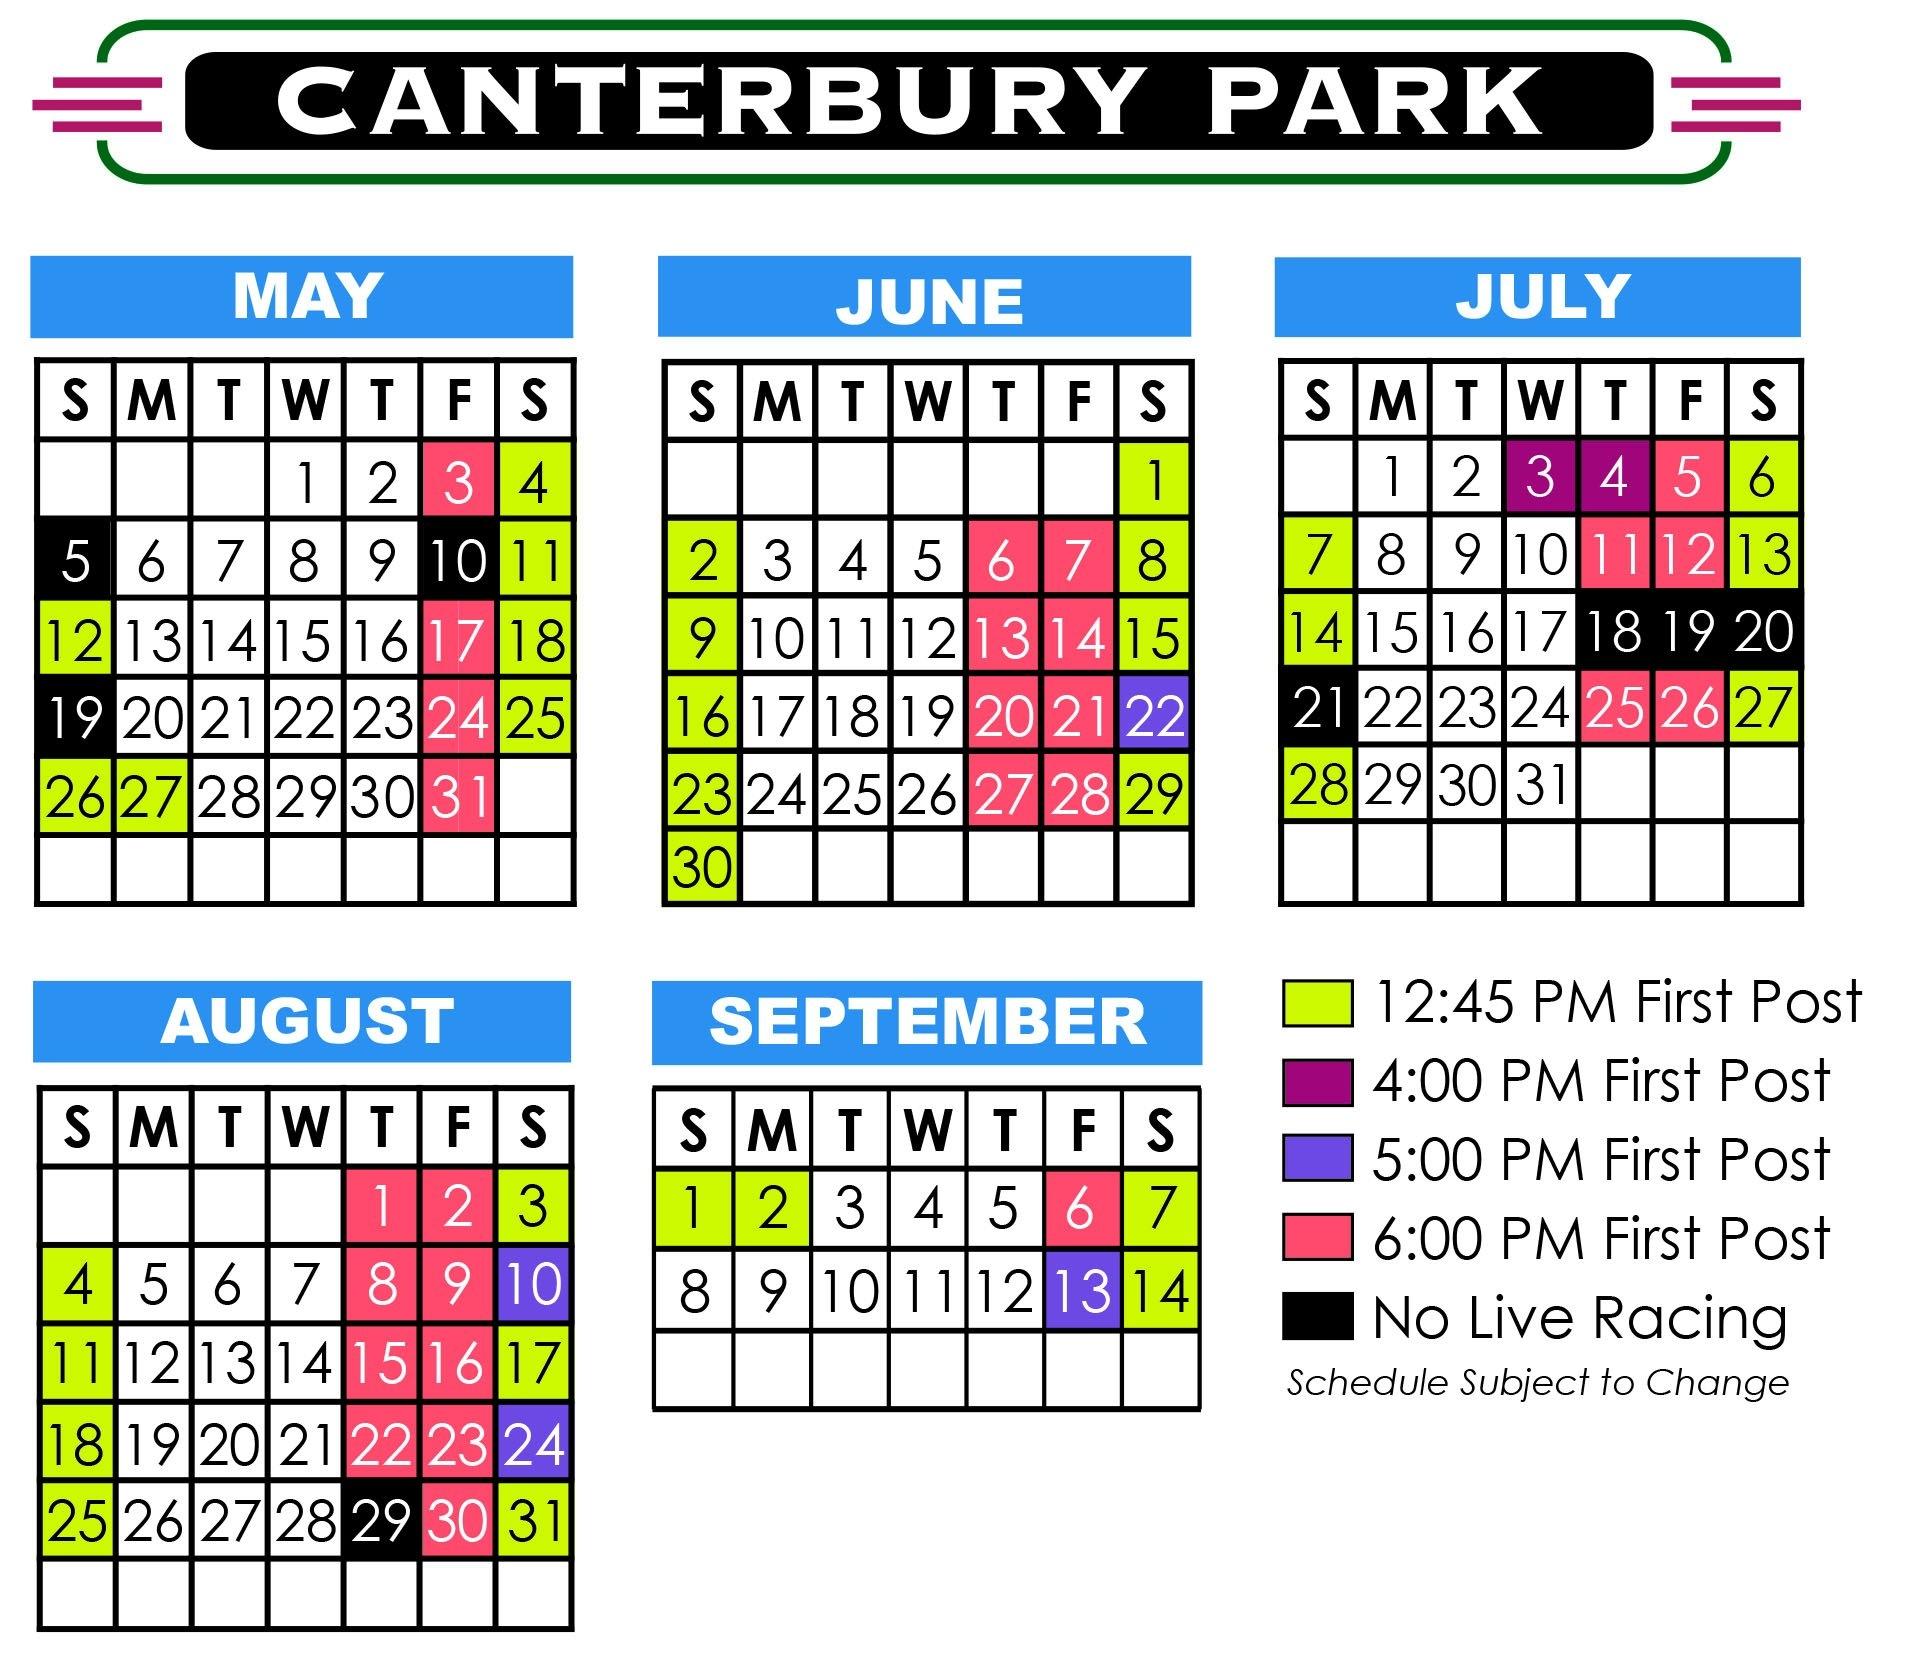 2019 Live Racing Season   Promotions   Canterbury Park 445 Calendar 2019